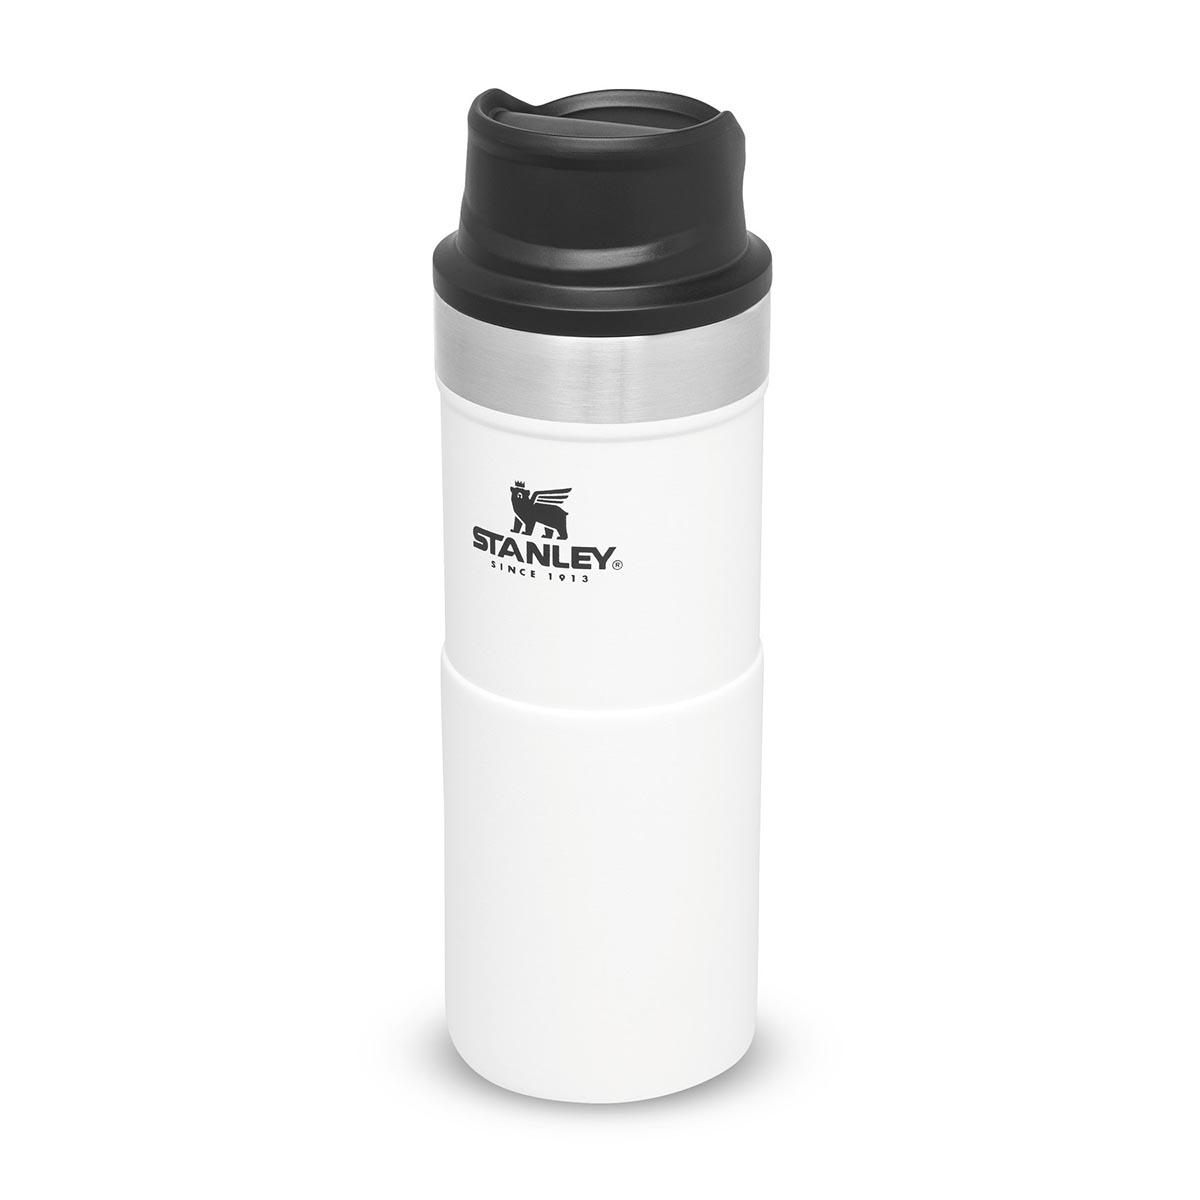 Stanley The Trigger-Action Travel Mug .35L / 12OZ AS1009848008